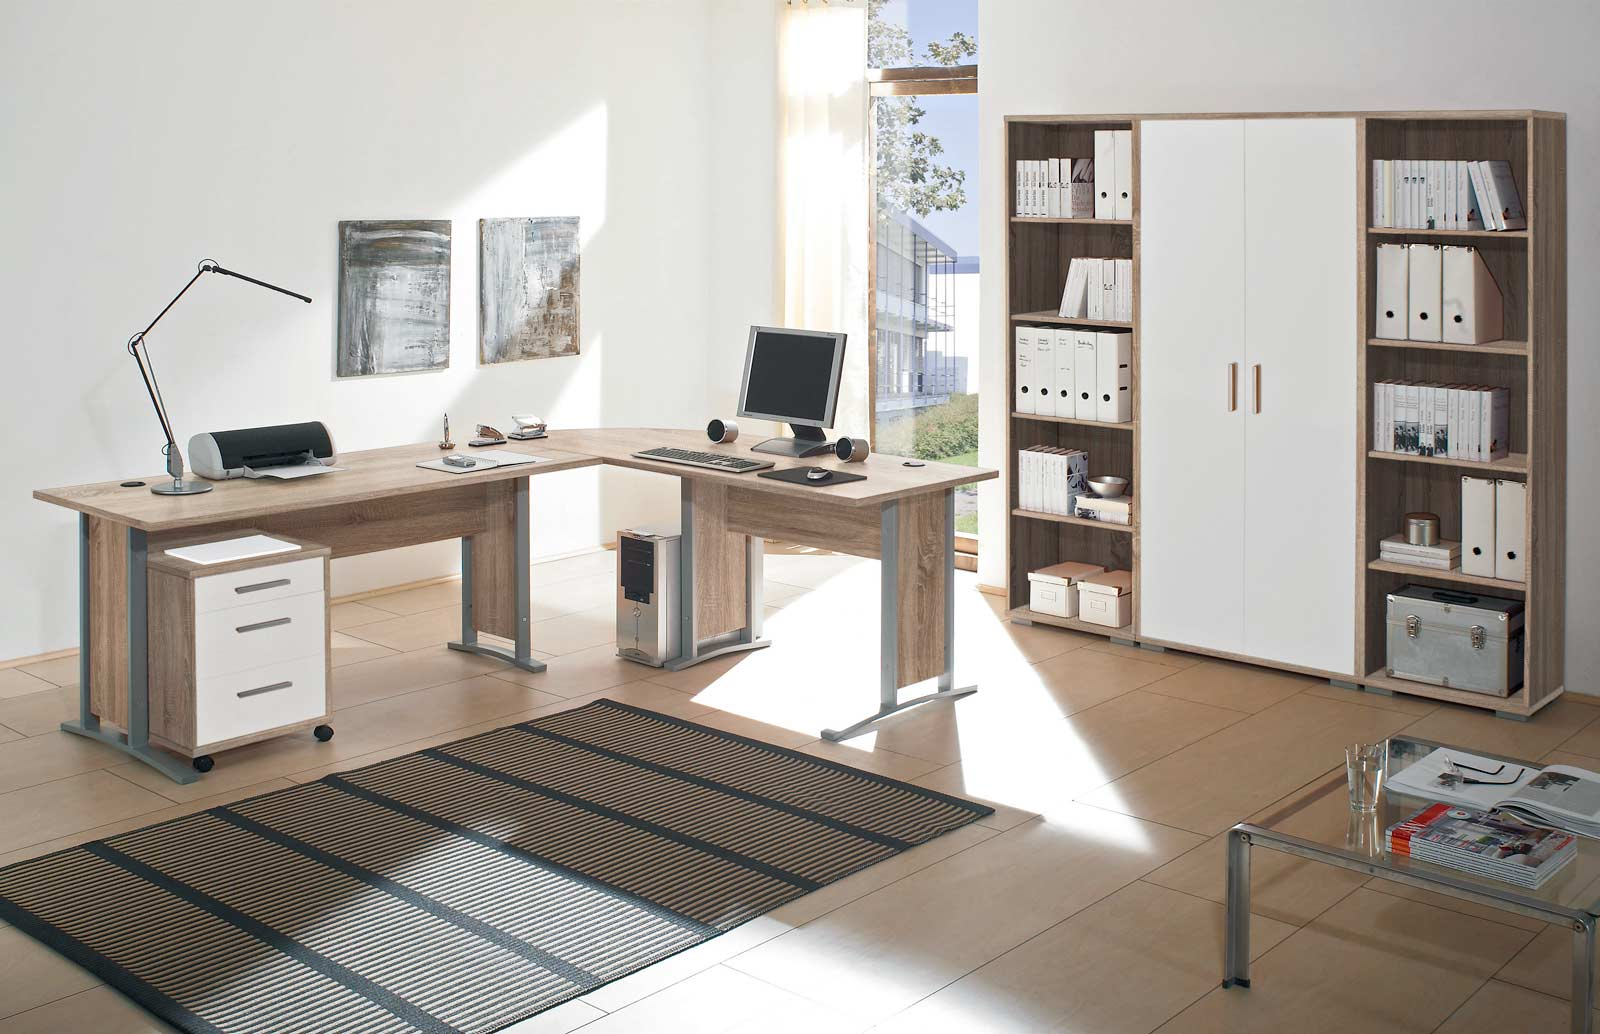 arbeitszimmer b rom bel b roeinrichtung b ro komplett. Black Bedroom Furniture Sets. Home Design Ideas